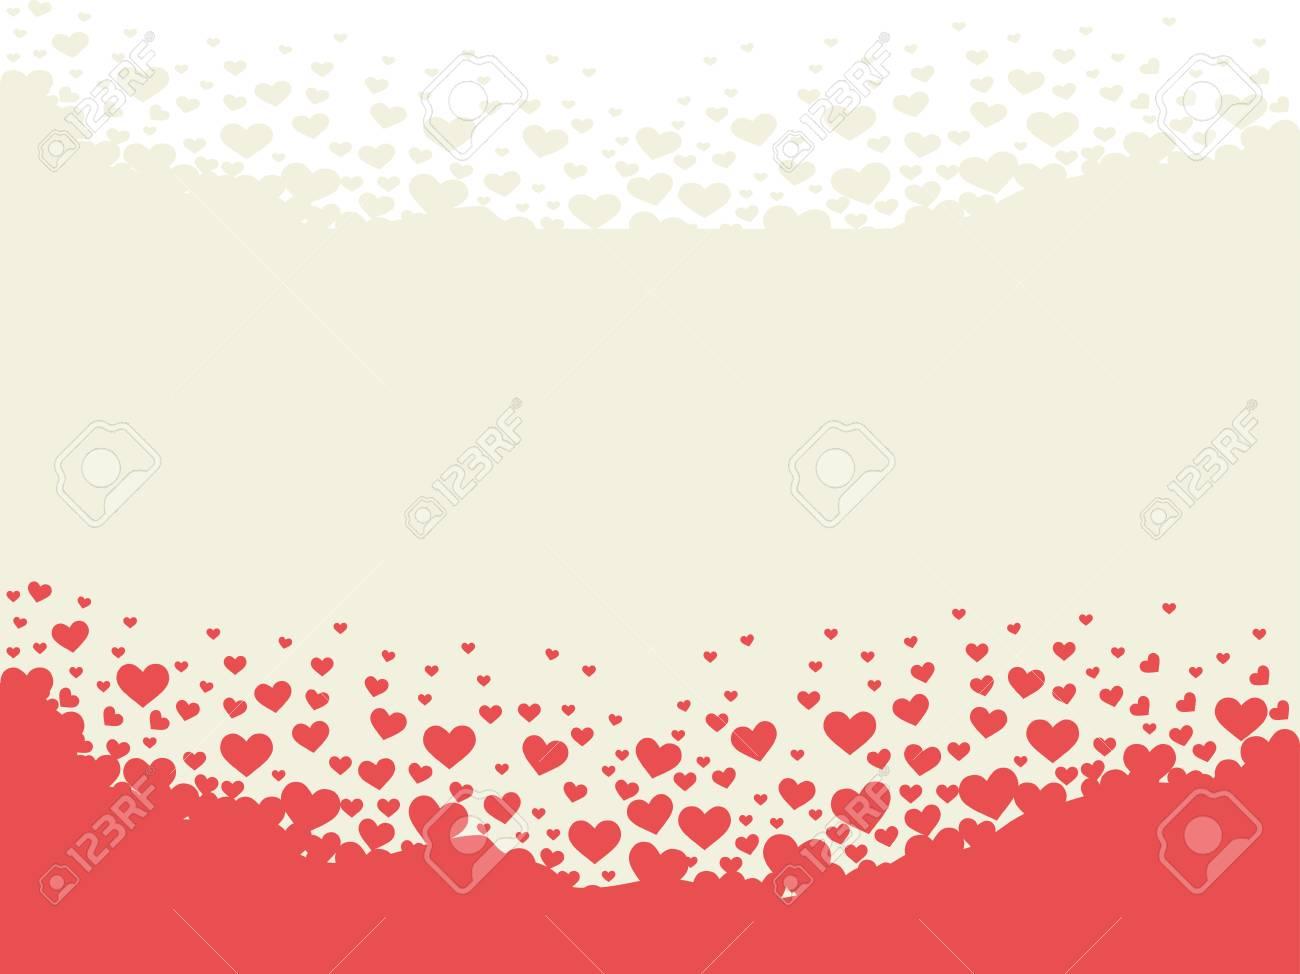 valentine heart shape theme background vector design for gift